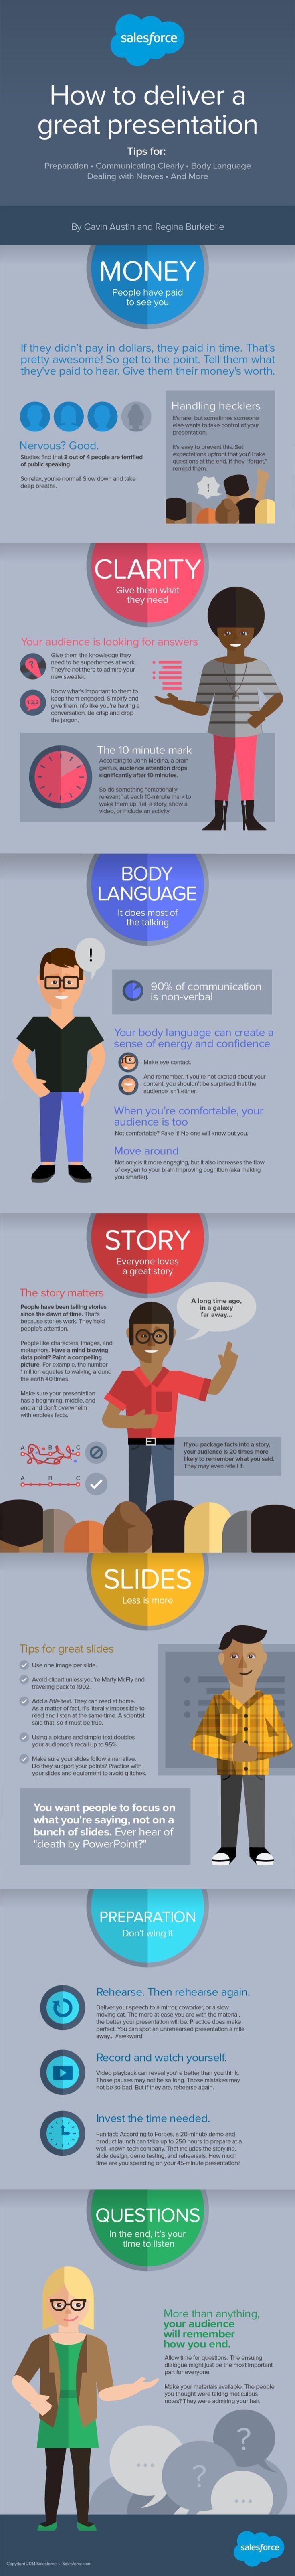 Communication Tips ... How to Deliver a Great Presentation #entrepreneurs #publicspeaking http://www.OneMorePress.com